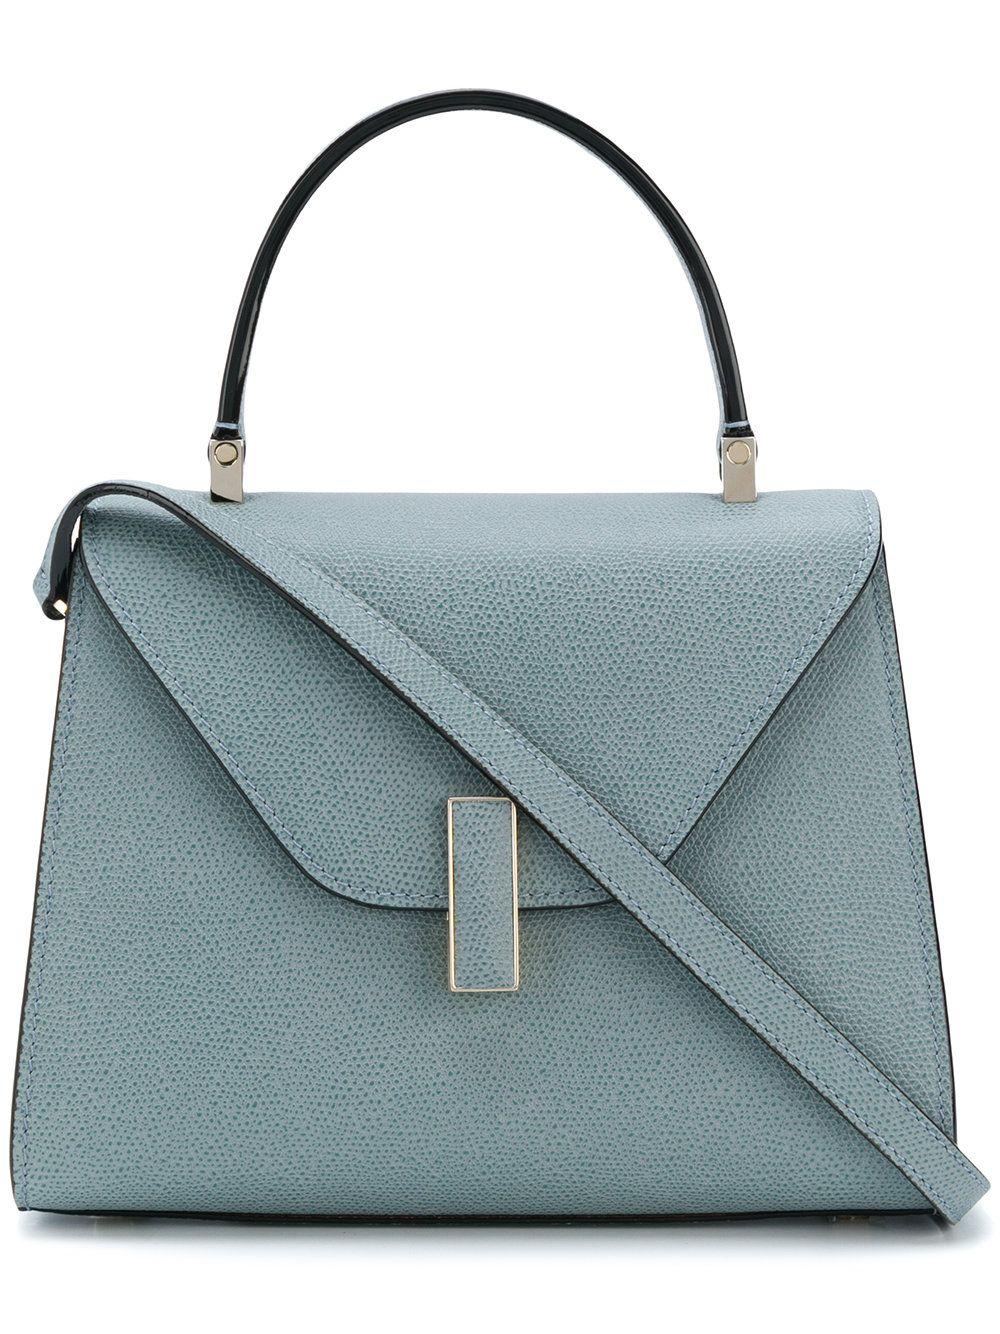 Valextra Shoulder Bag for Women On Sale, Black, Leather, 2017, one size